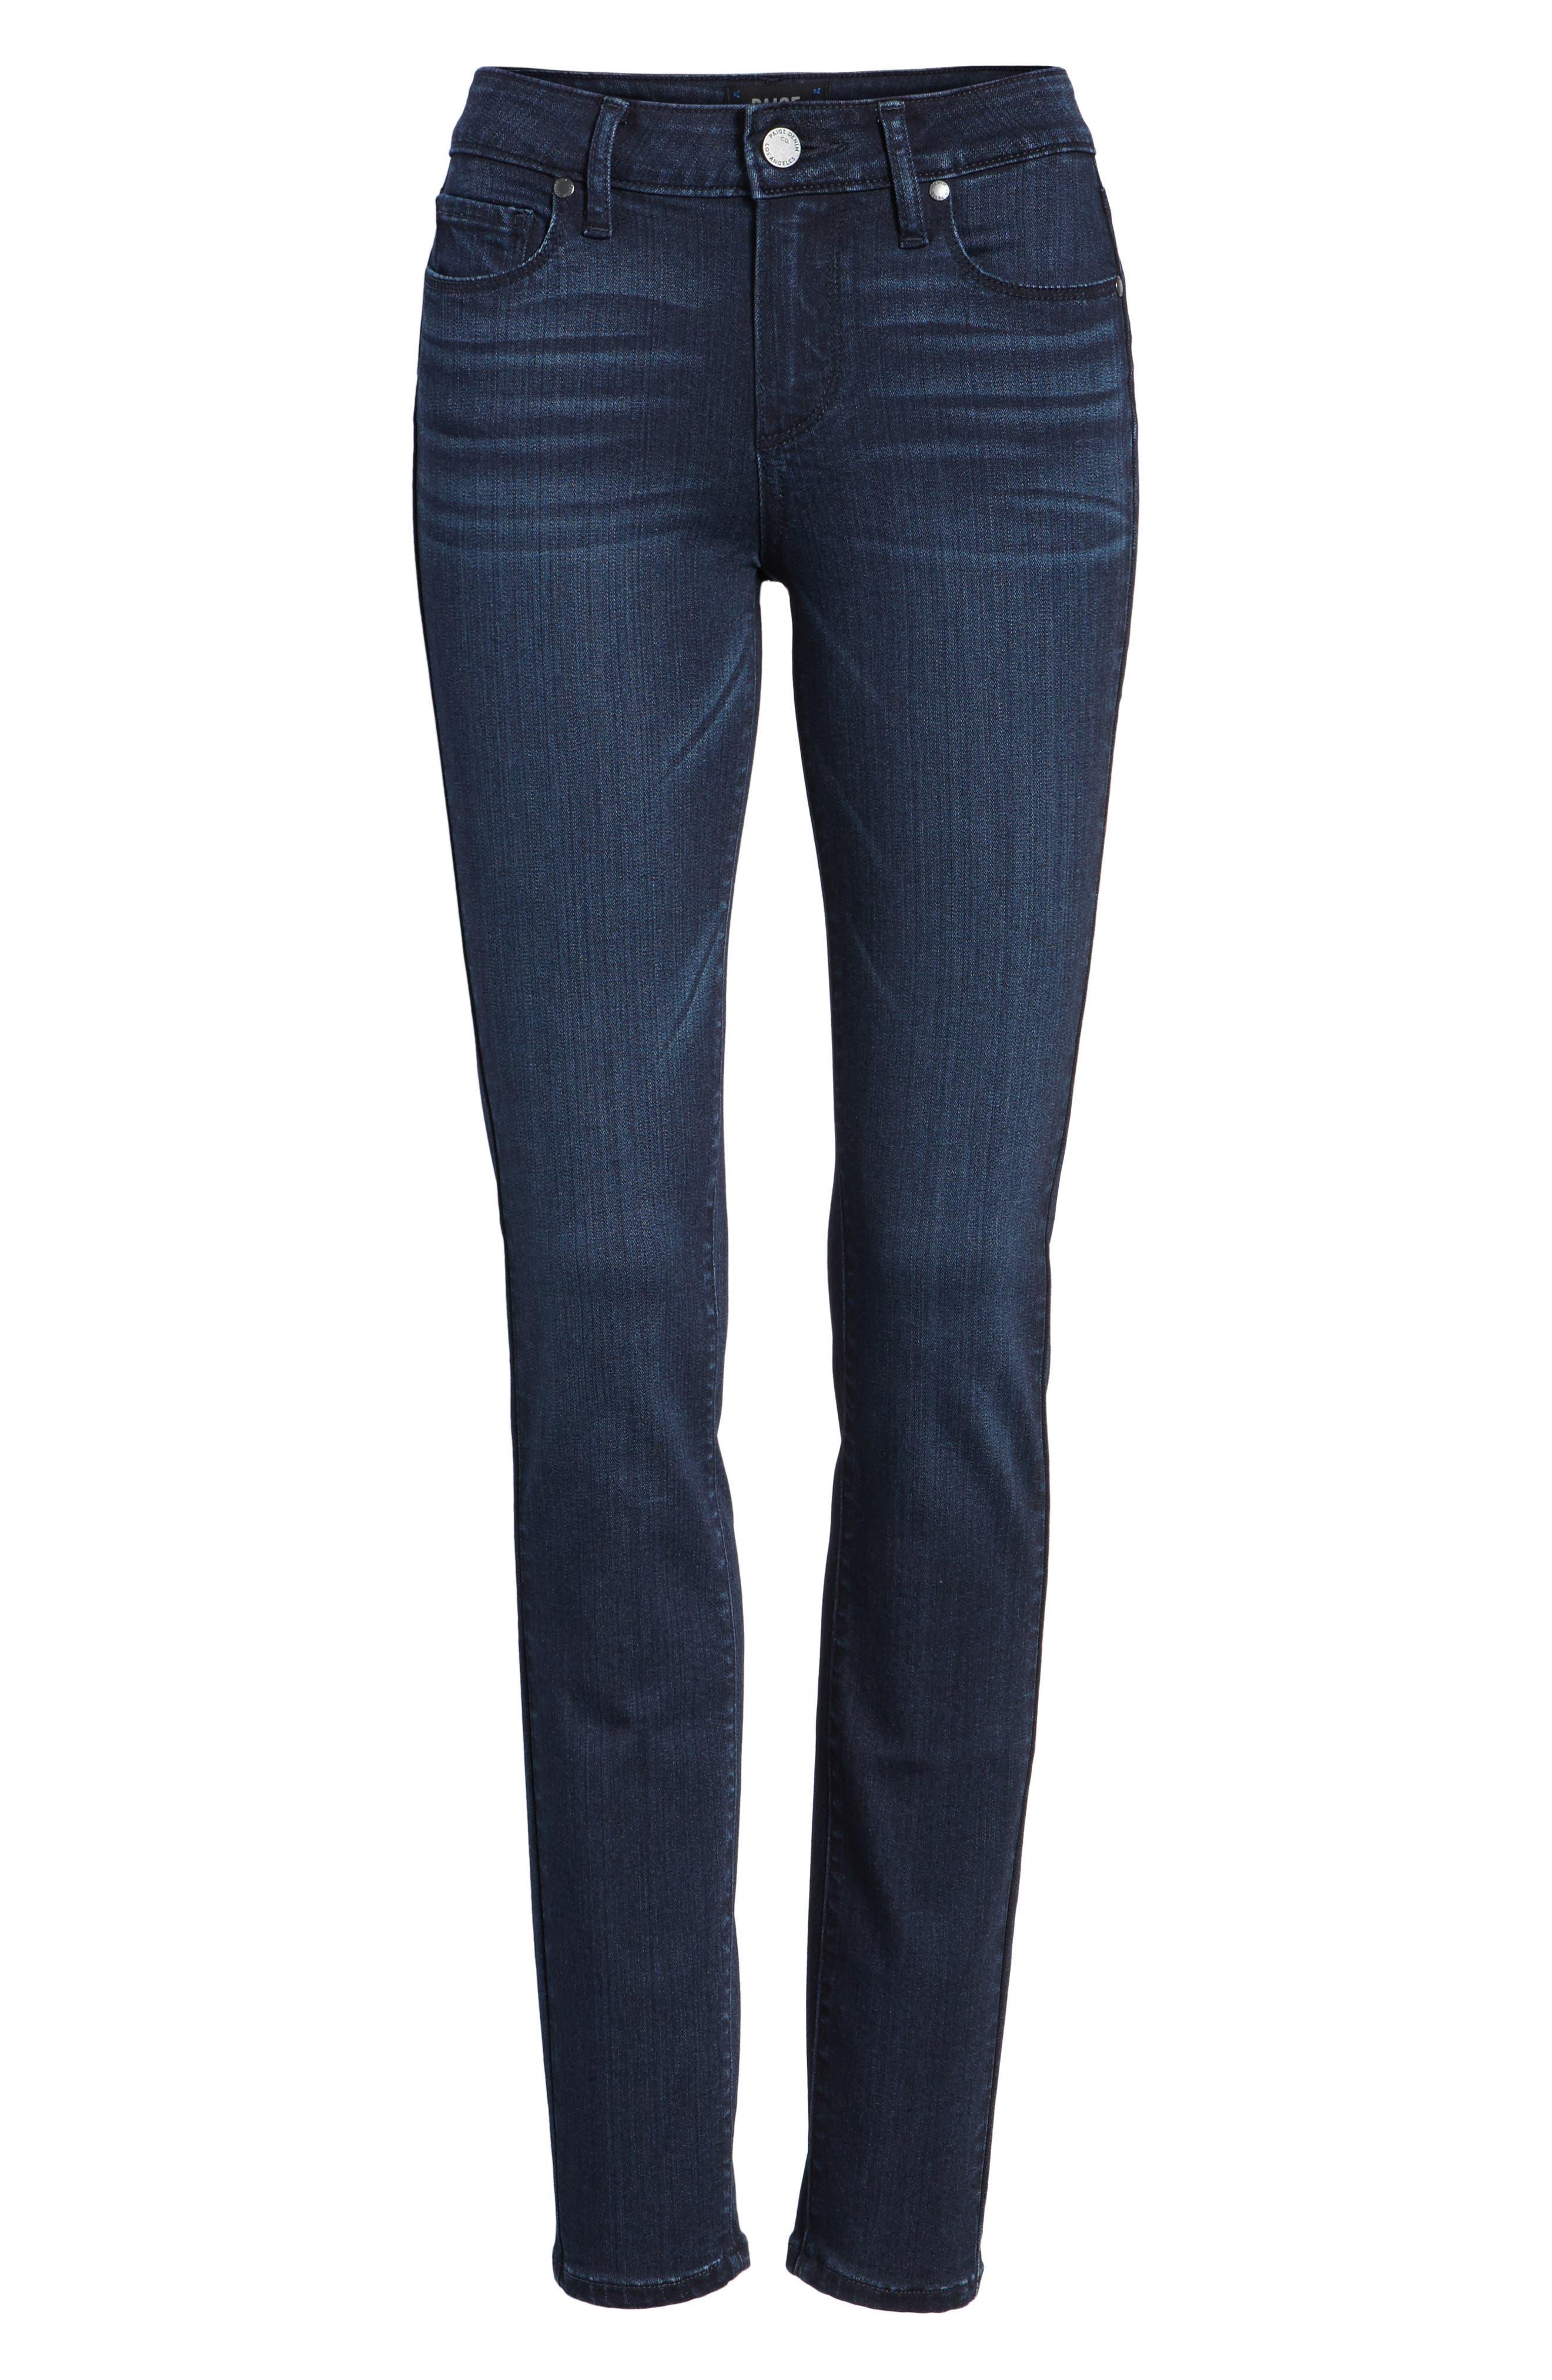 Transcend - Verdugo Ultra Skinny Jeans,                             Alternate thumbnail 6, color,